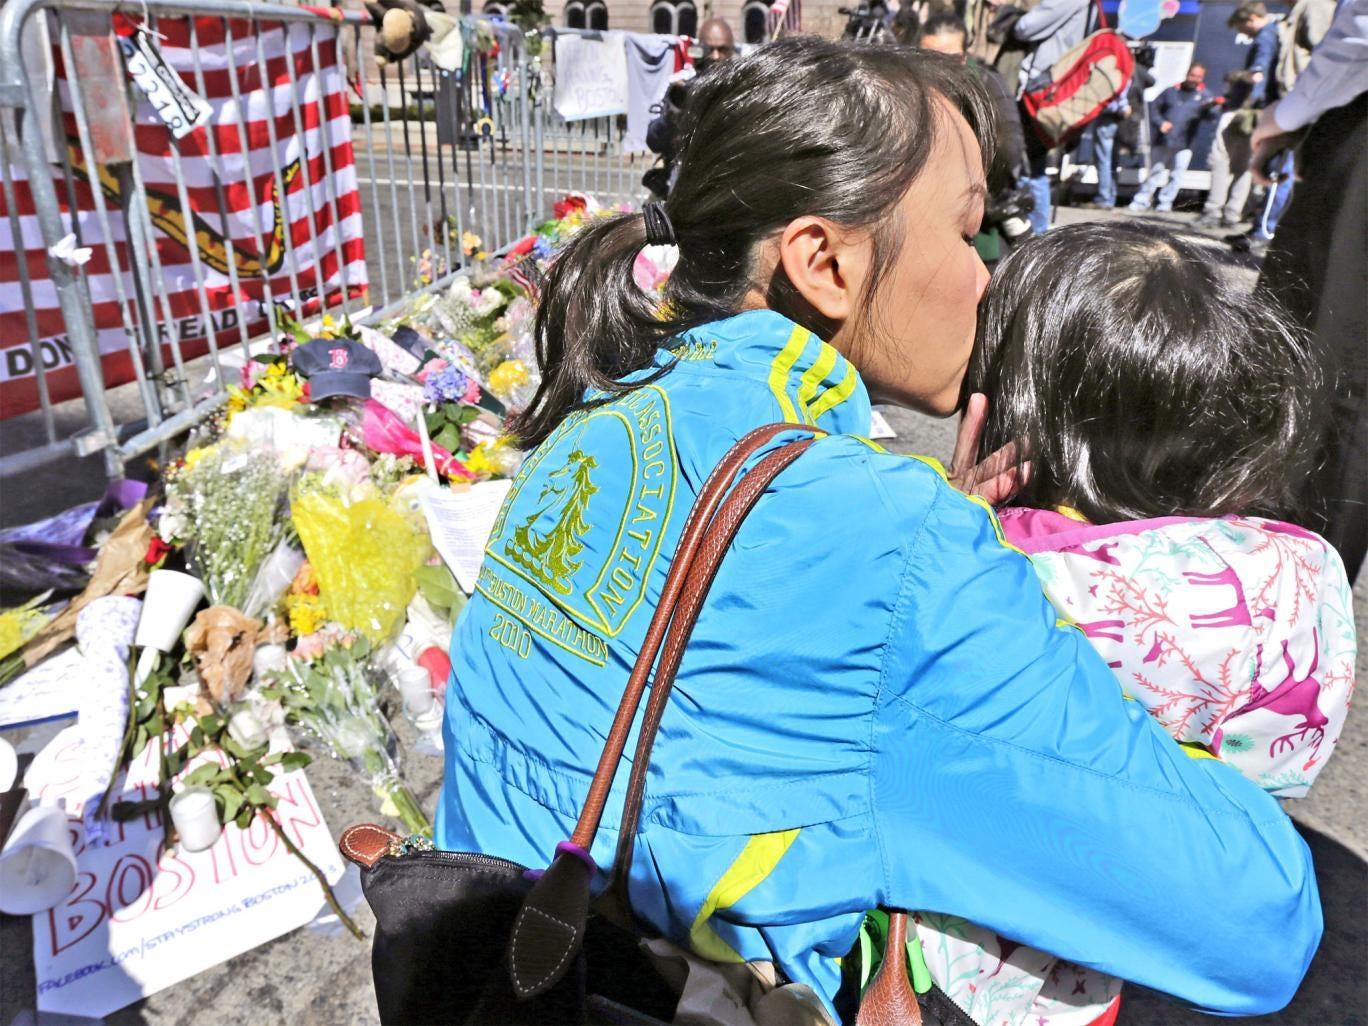 Marathon runner Vu Trang kisses her two-year-old daughter Cara at a memorial in Boylston Street